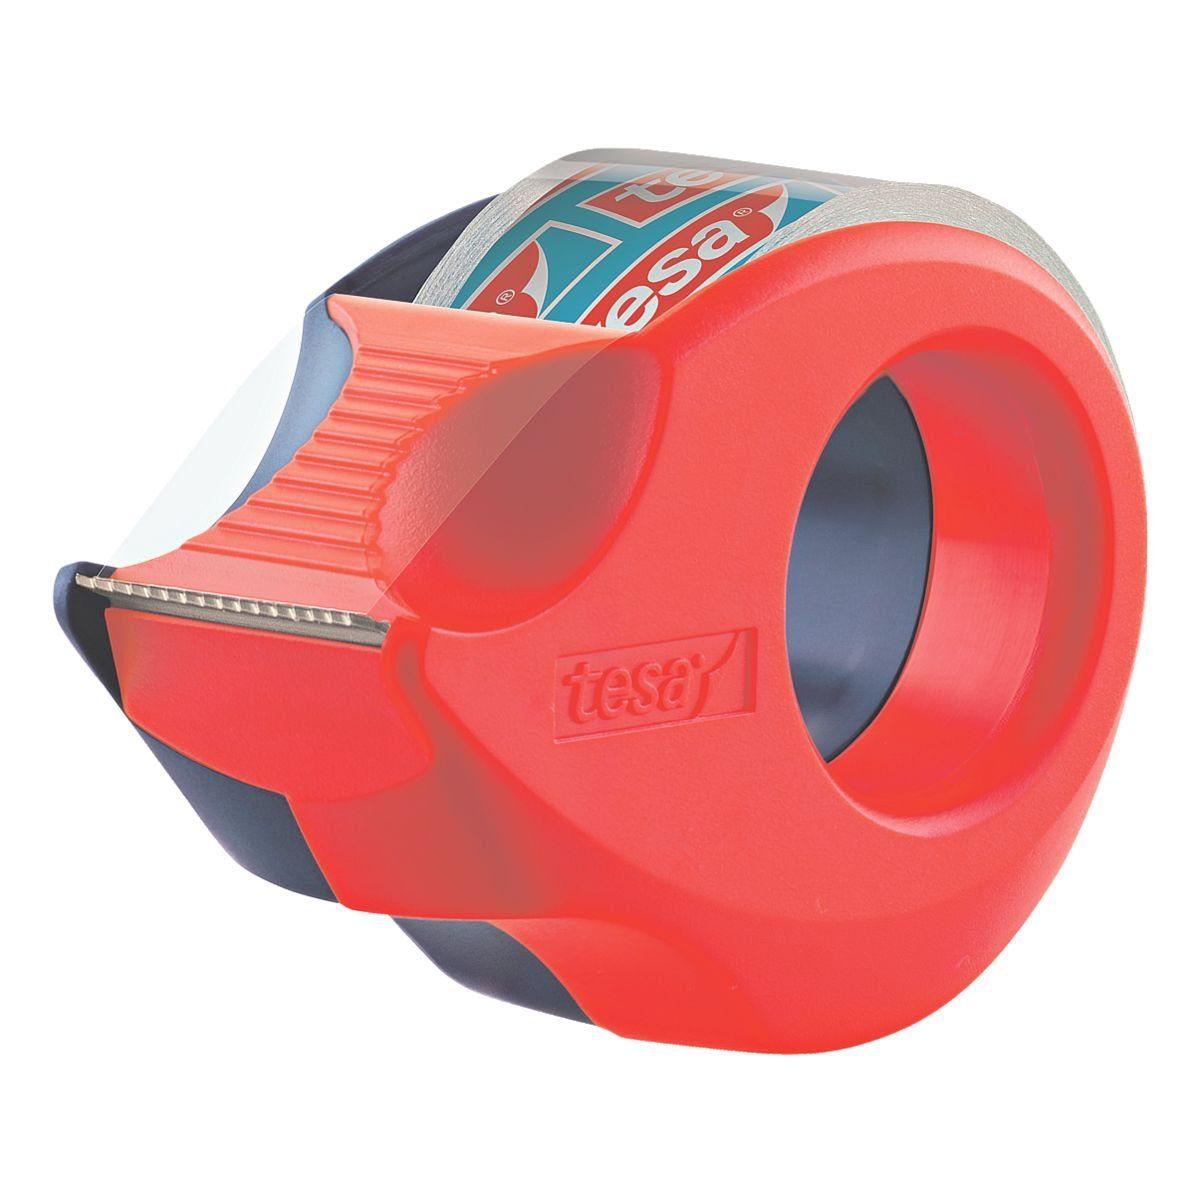 Tesa Mini-Handabroller inkl. Klebefilm »kristall-klar«